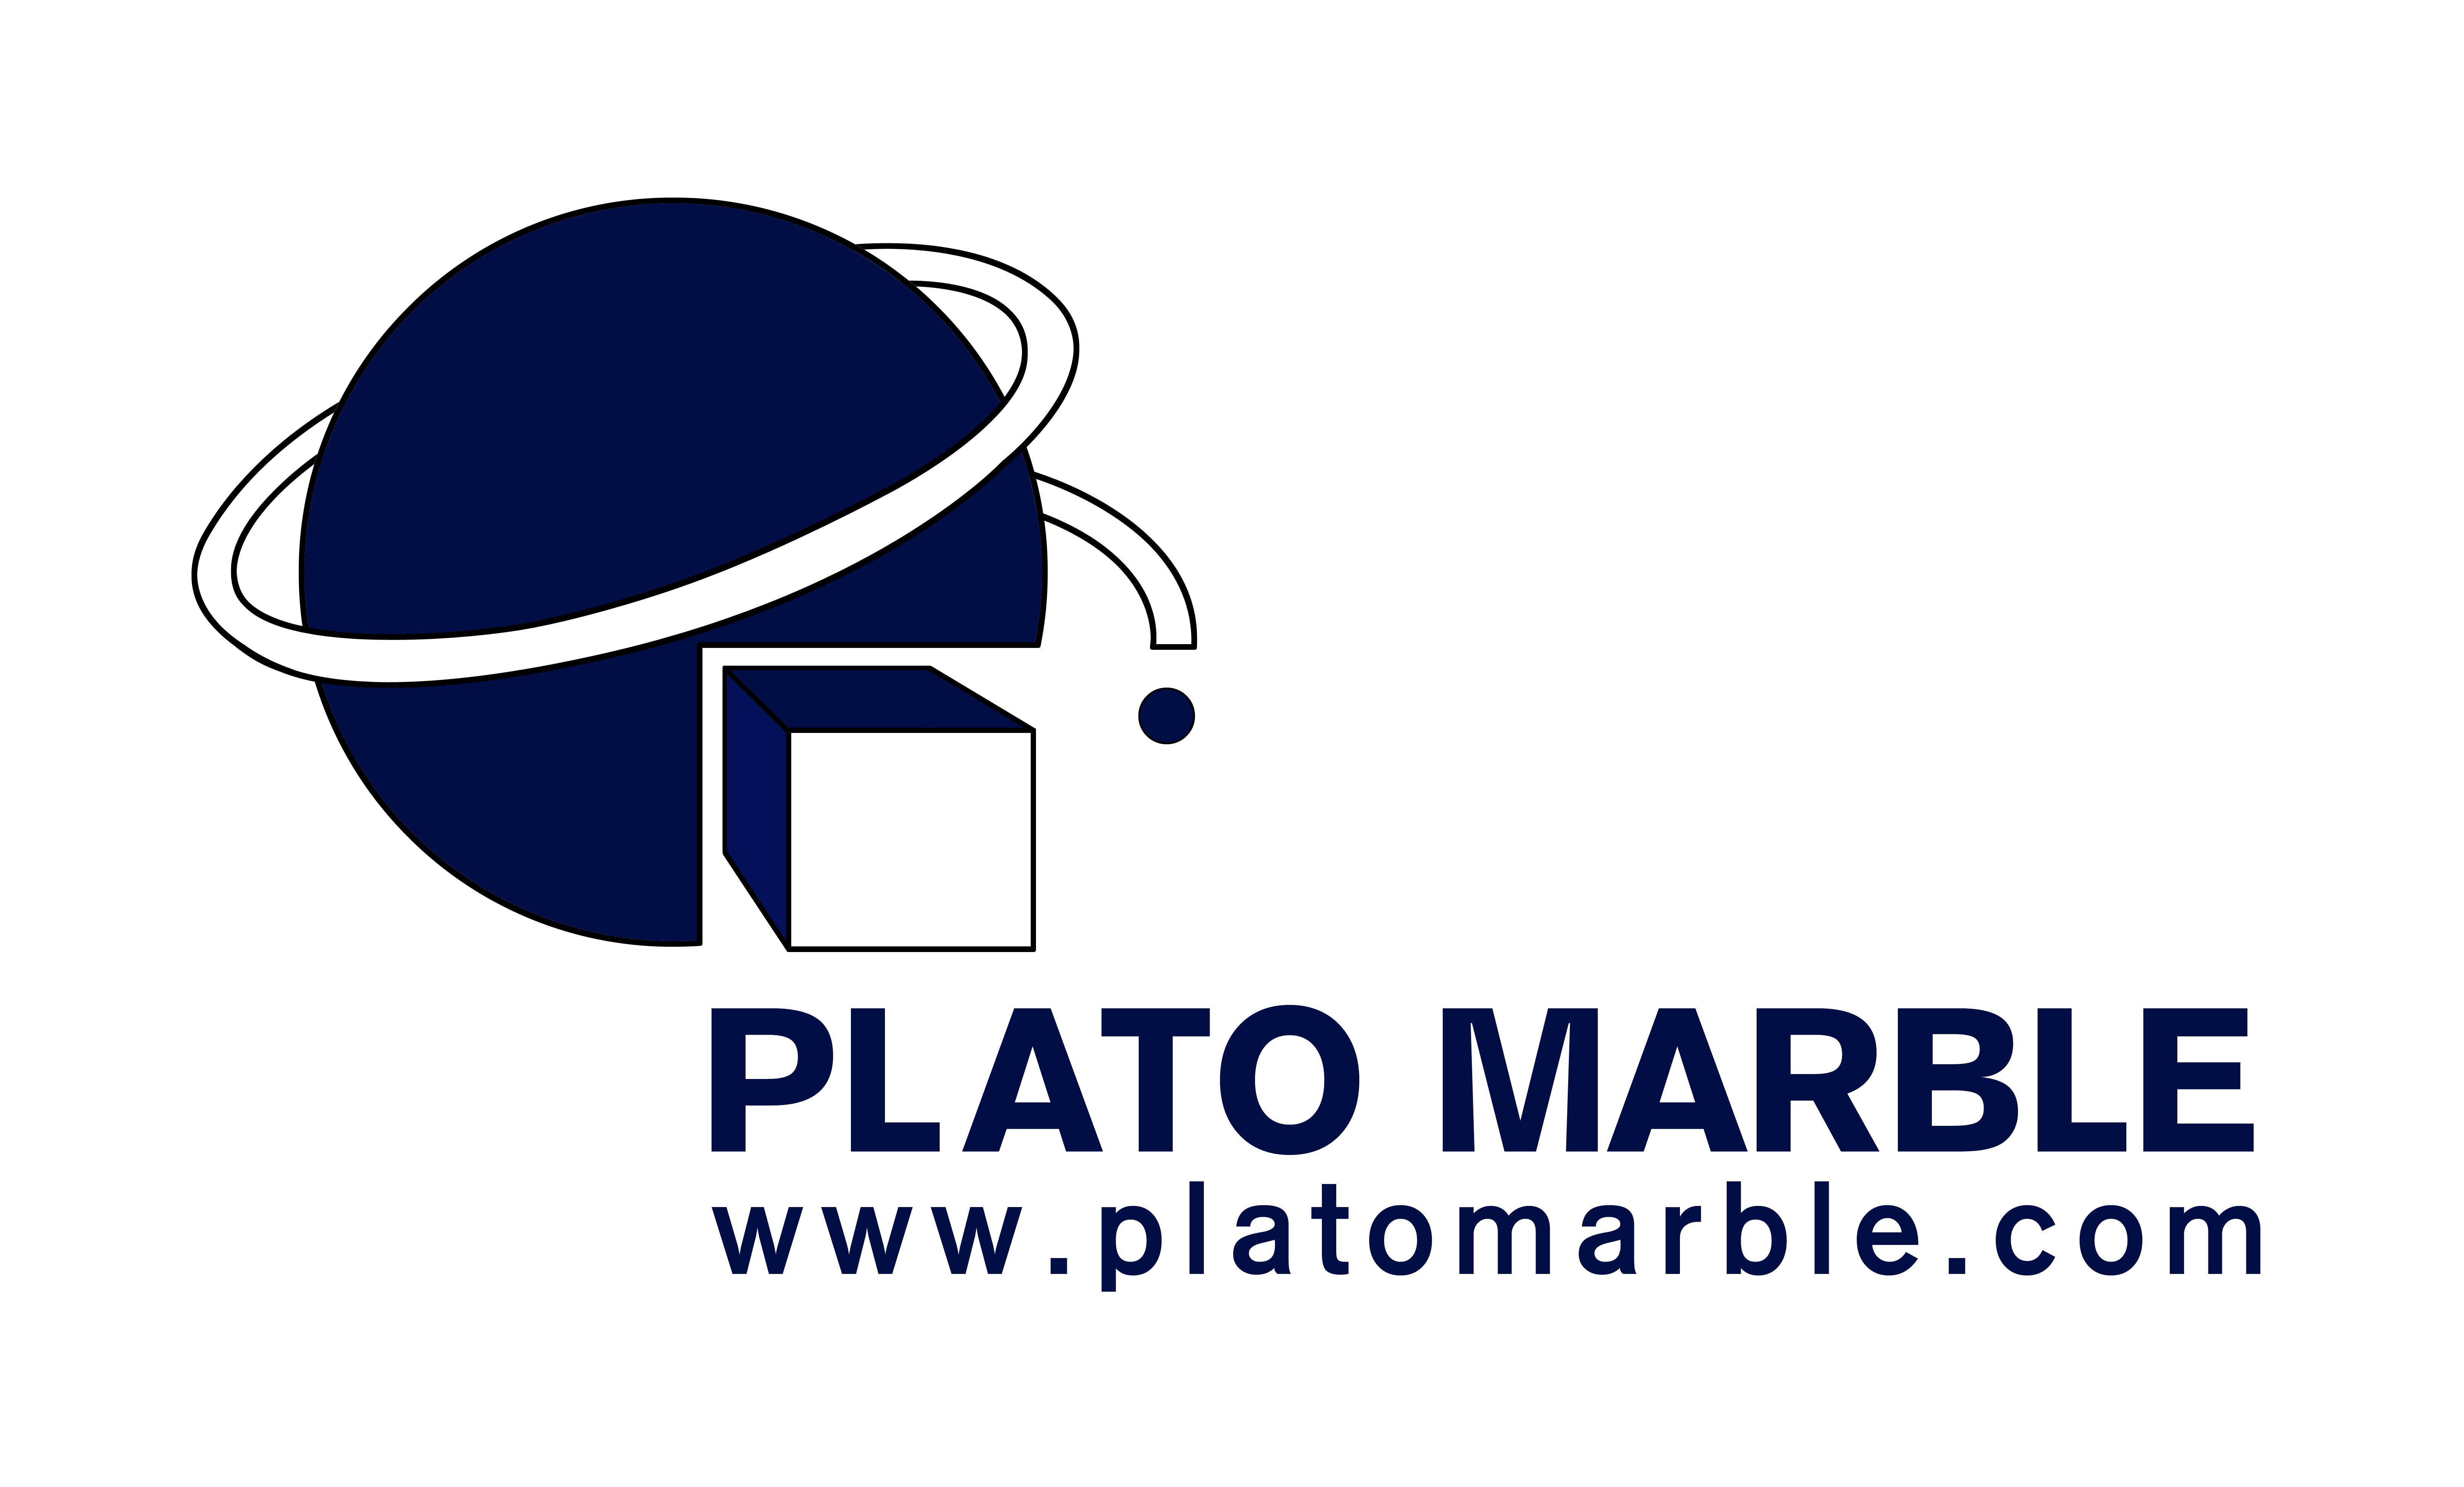 PLATO MERMER MADENCİLİK İNŞAAT SANAYİ VE TİCARET LİMİTED ŞİRKETİ, PLATO MARBLE